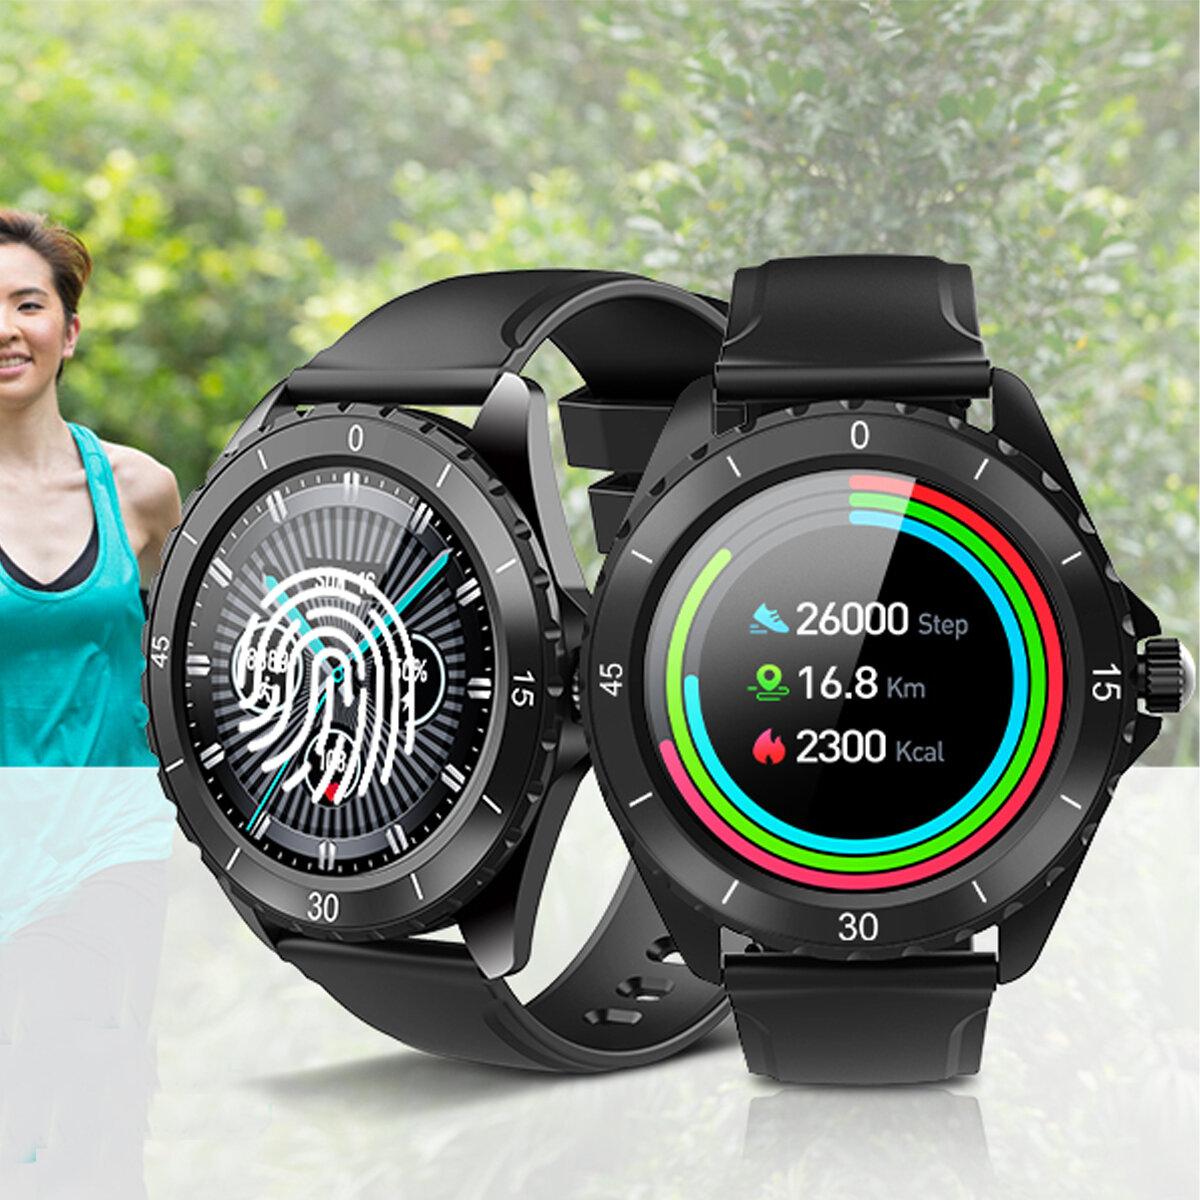 ELEGIANT C520 BT 5.0 1.3 inch Full Touch Screen Heart Rate Sleep Monitor 30 Days Standby IP68 Waterproof Smart Watch